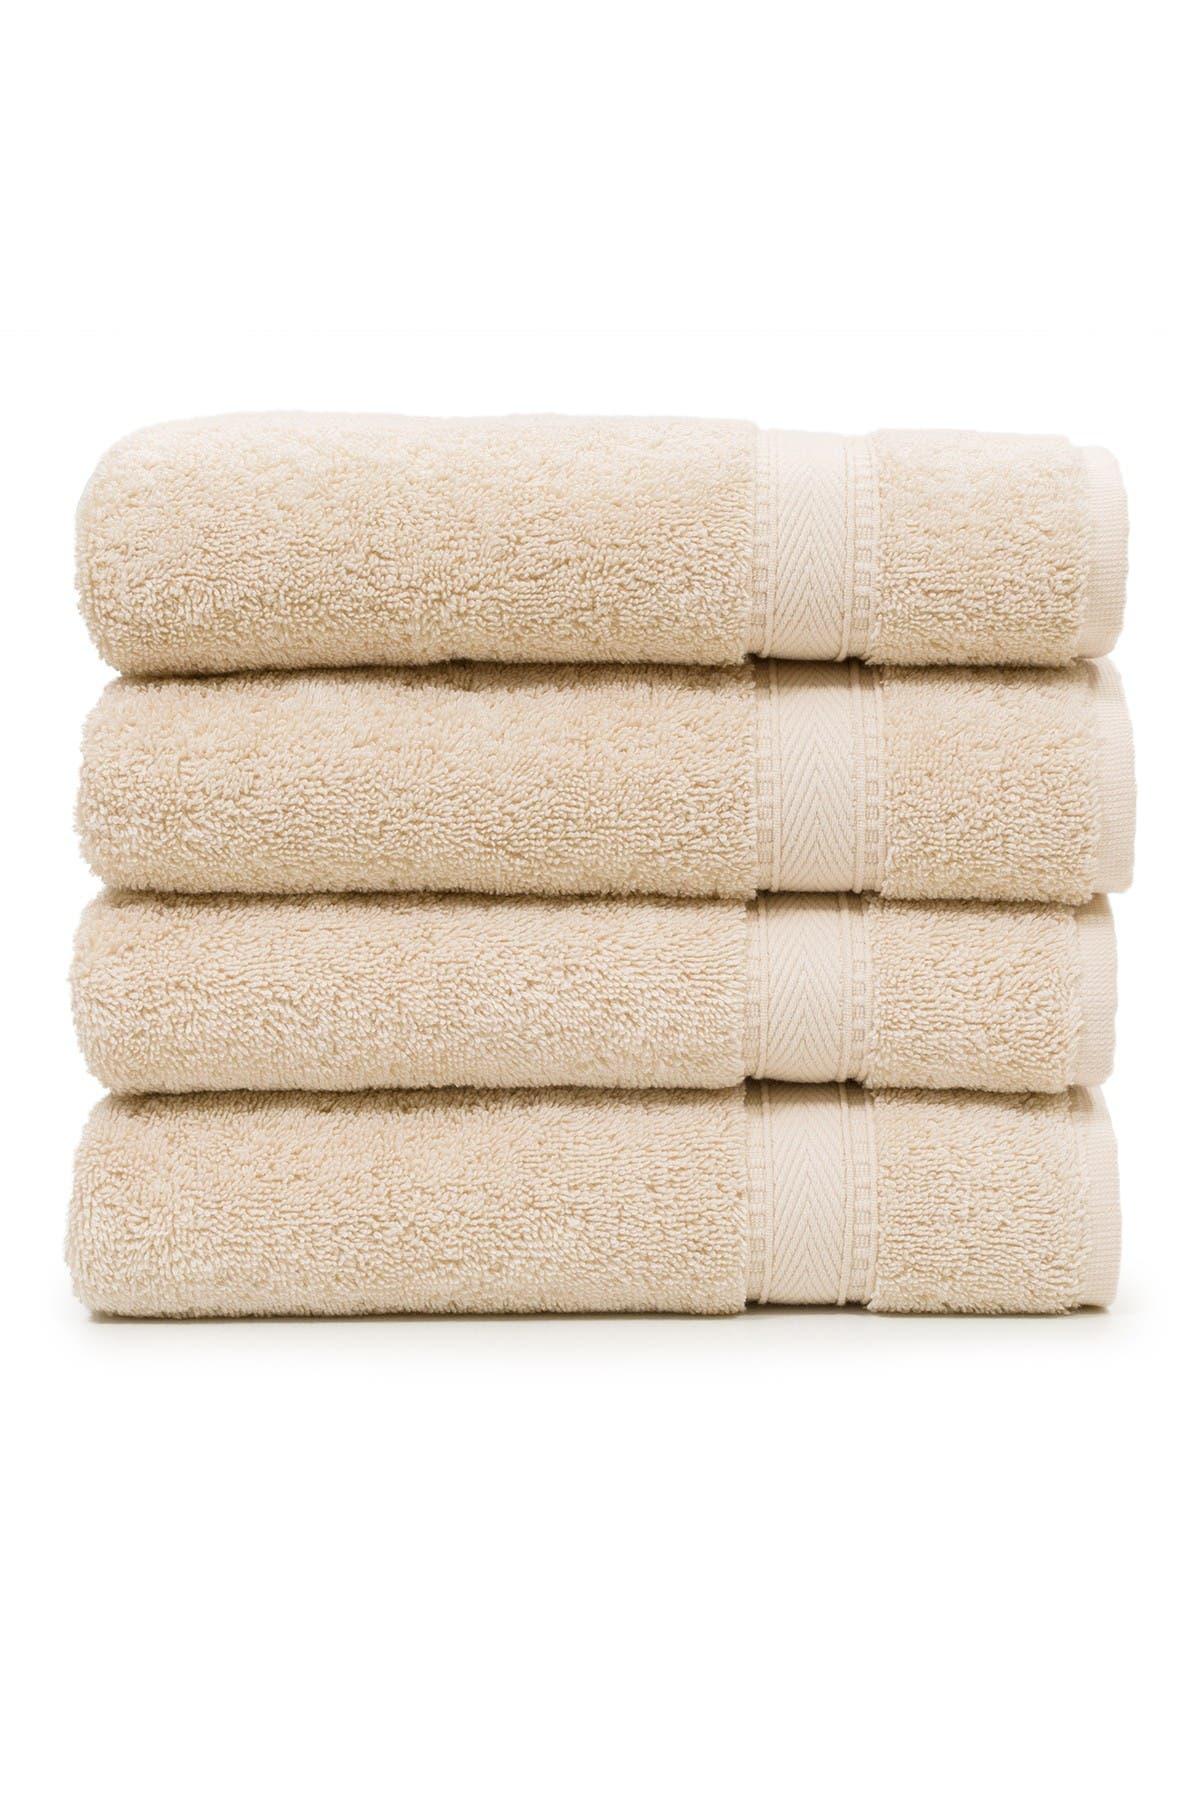 Image of LINUM HOME Sinemis Terry Hand Towels - Set of 4 - Beige